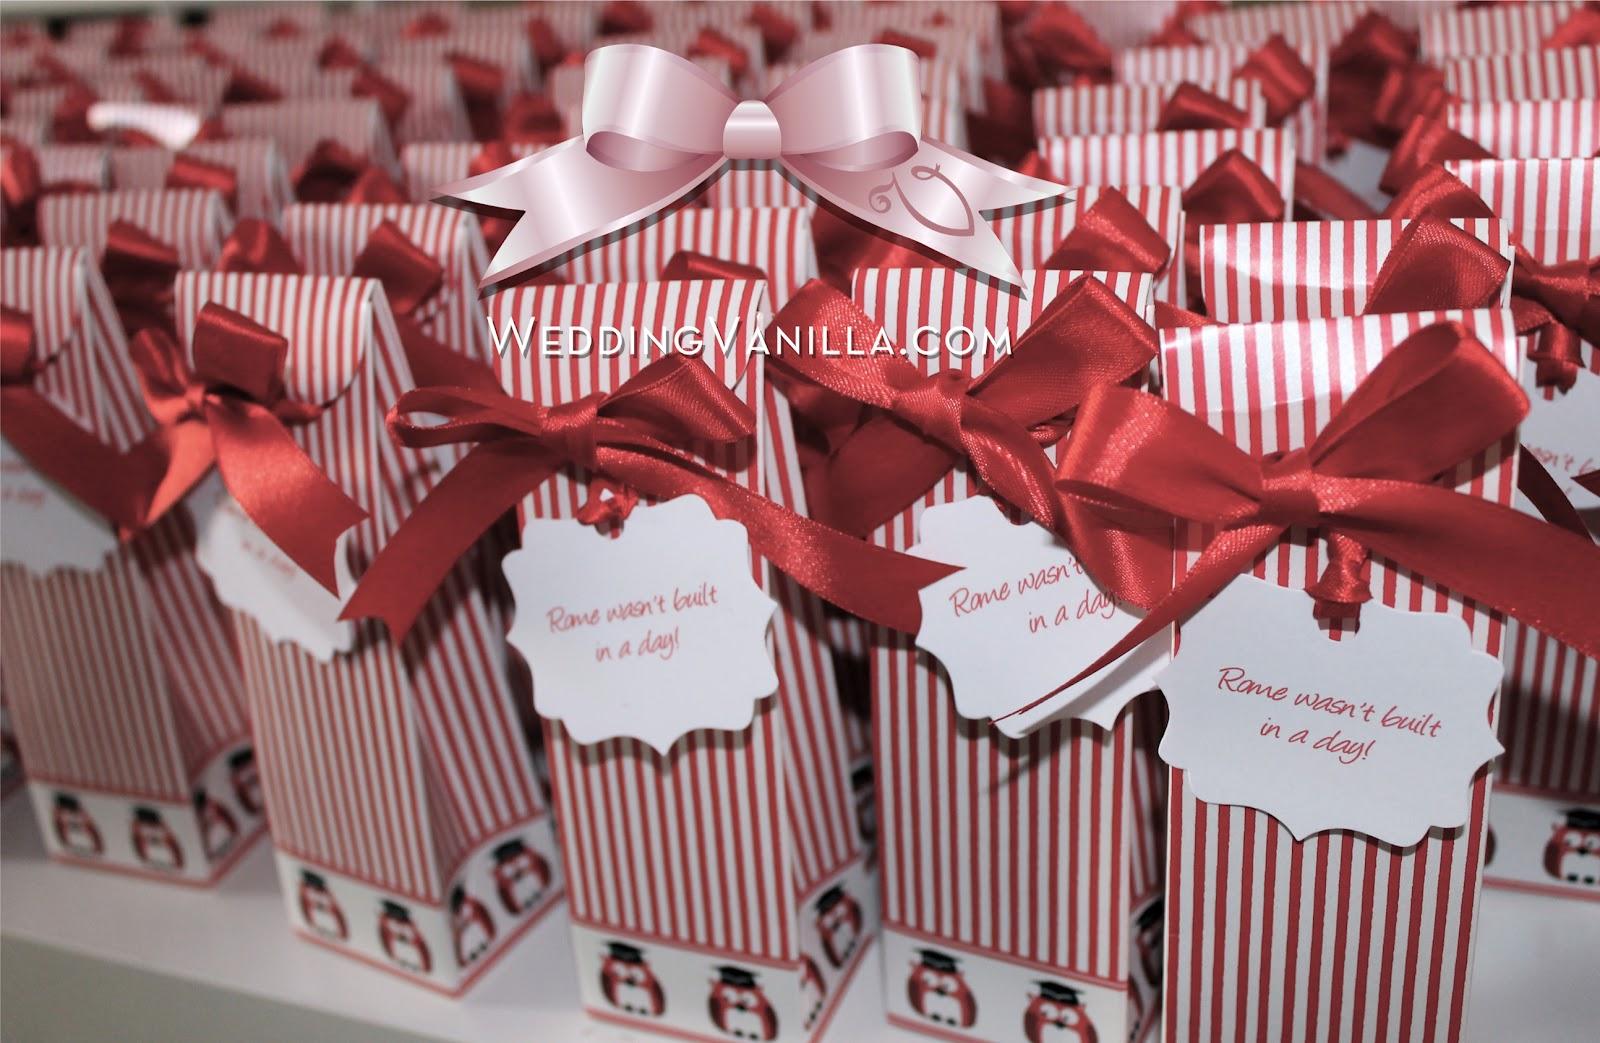 Souvent Vanilla Wedding Design: Le nostre idee per la tua festa di laurea VM01